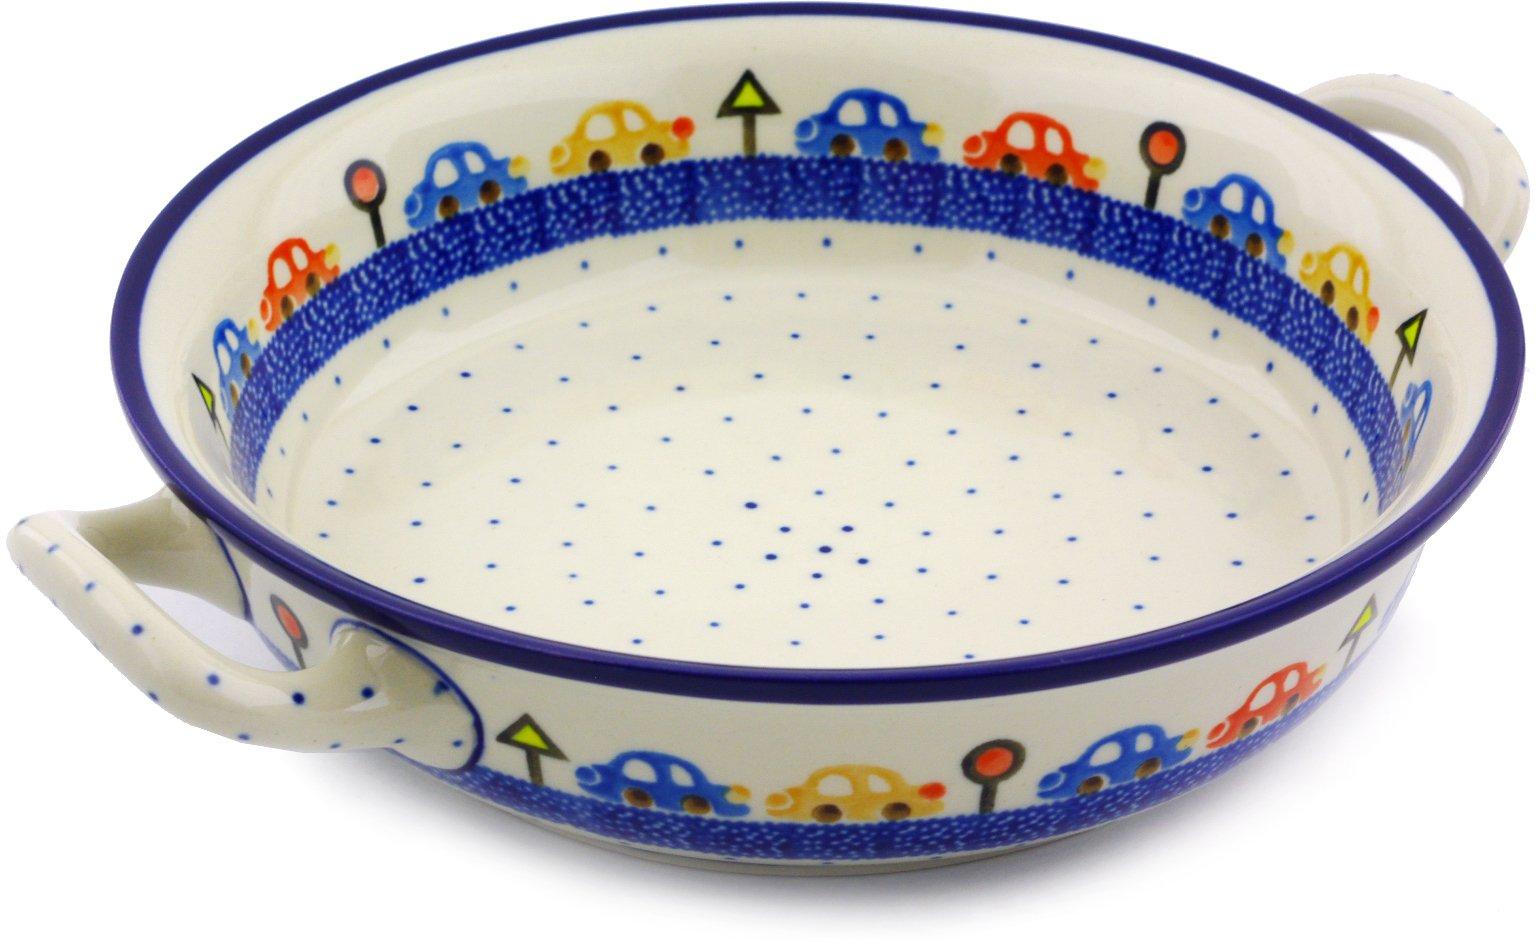 Polish Pottery Round Baker with Handles Medium made by Ceramika Artystyczna (Children's Chasing Cars Theme)